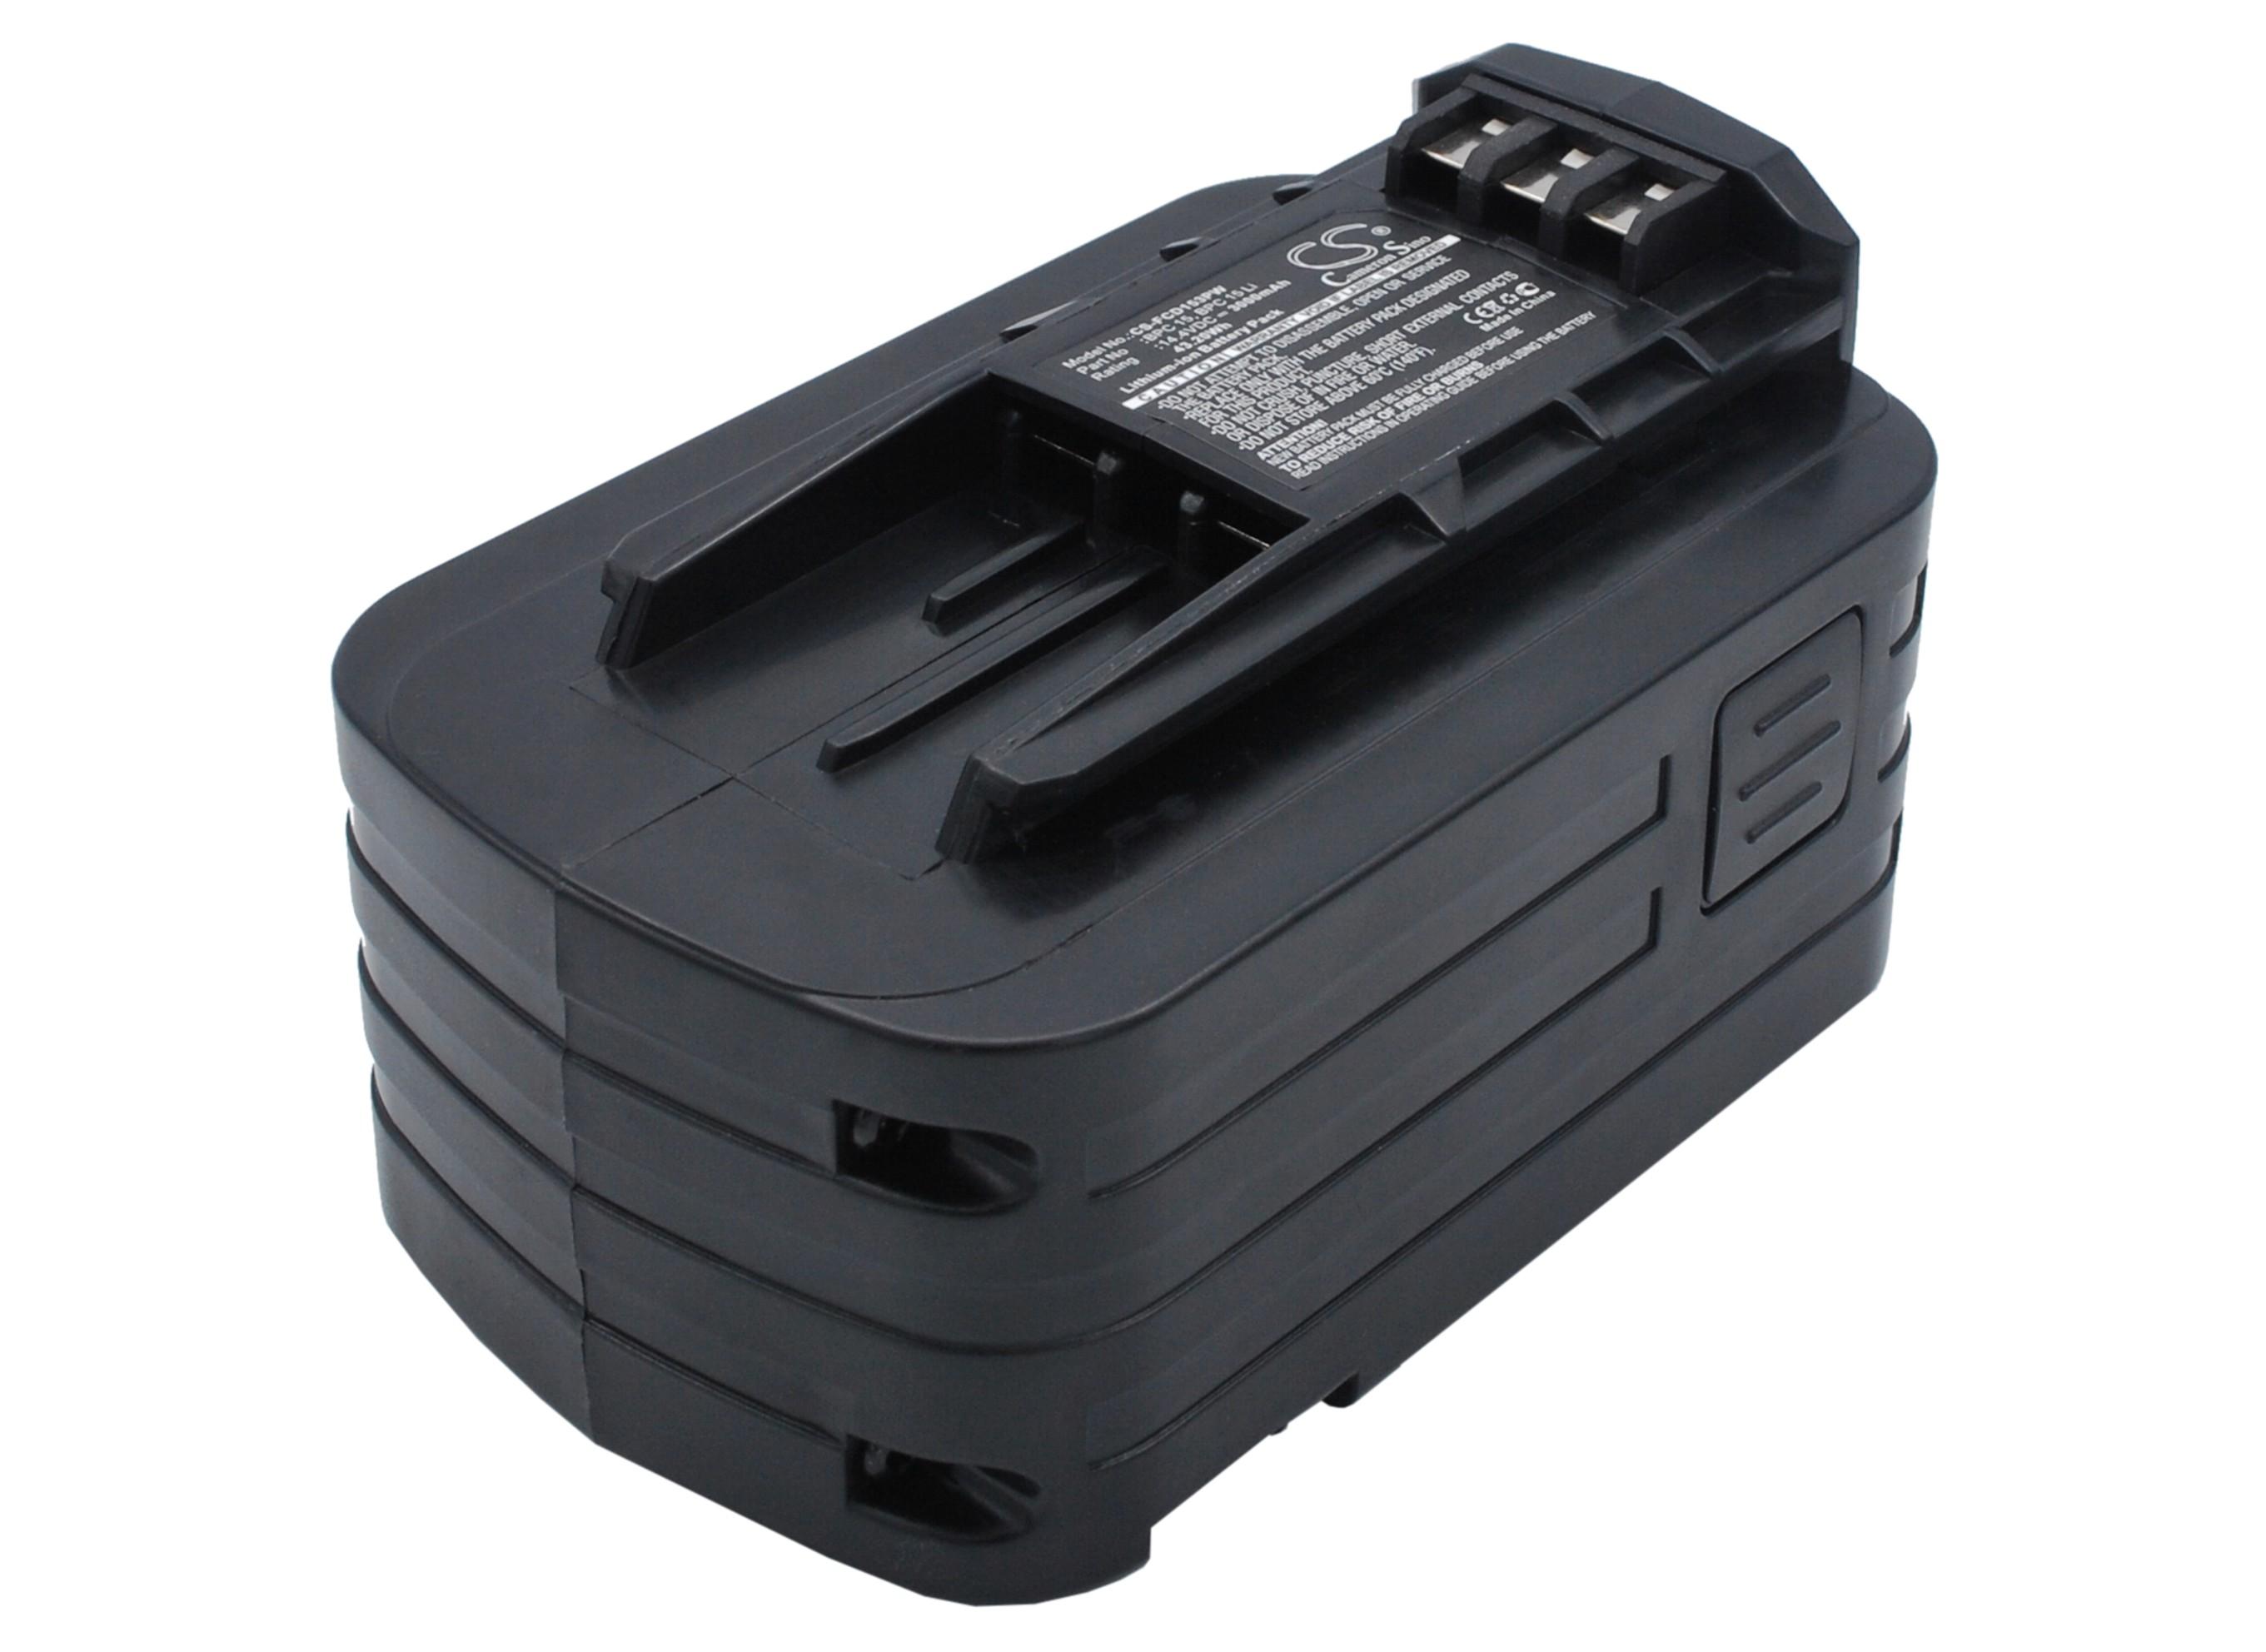 Cameron Sino baterie do nářadí pro FESTOOL C15 Cordless Drill/Driver 14.4V Li-ion 3000mAh černá - neoriginální